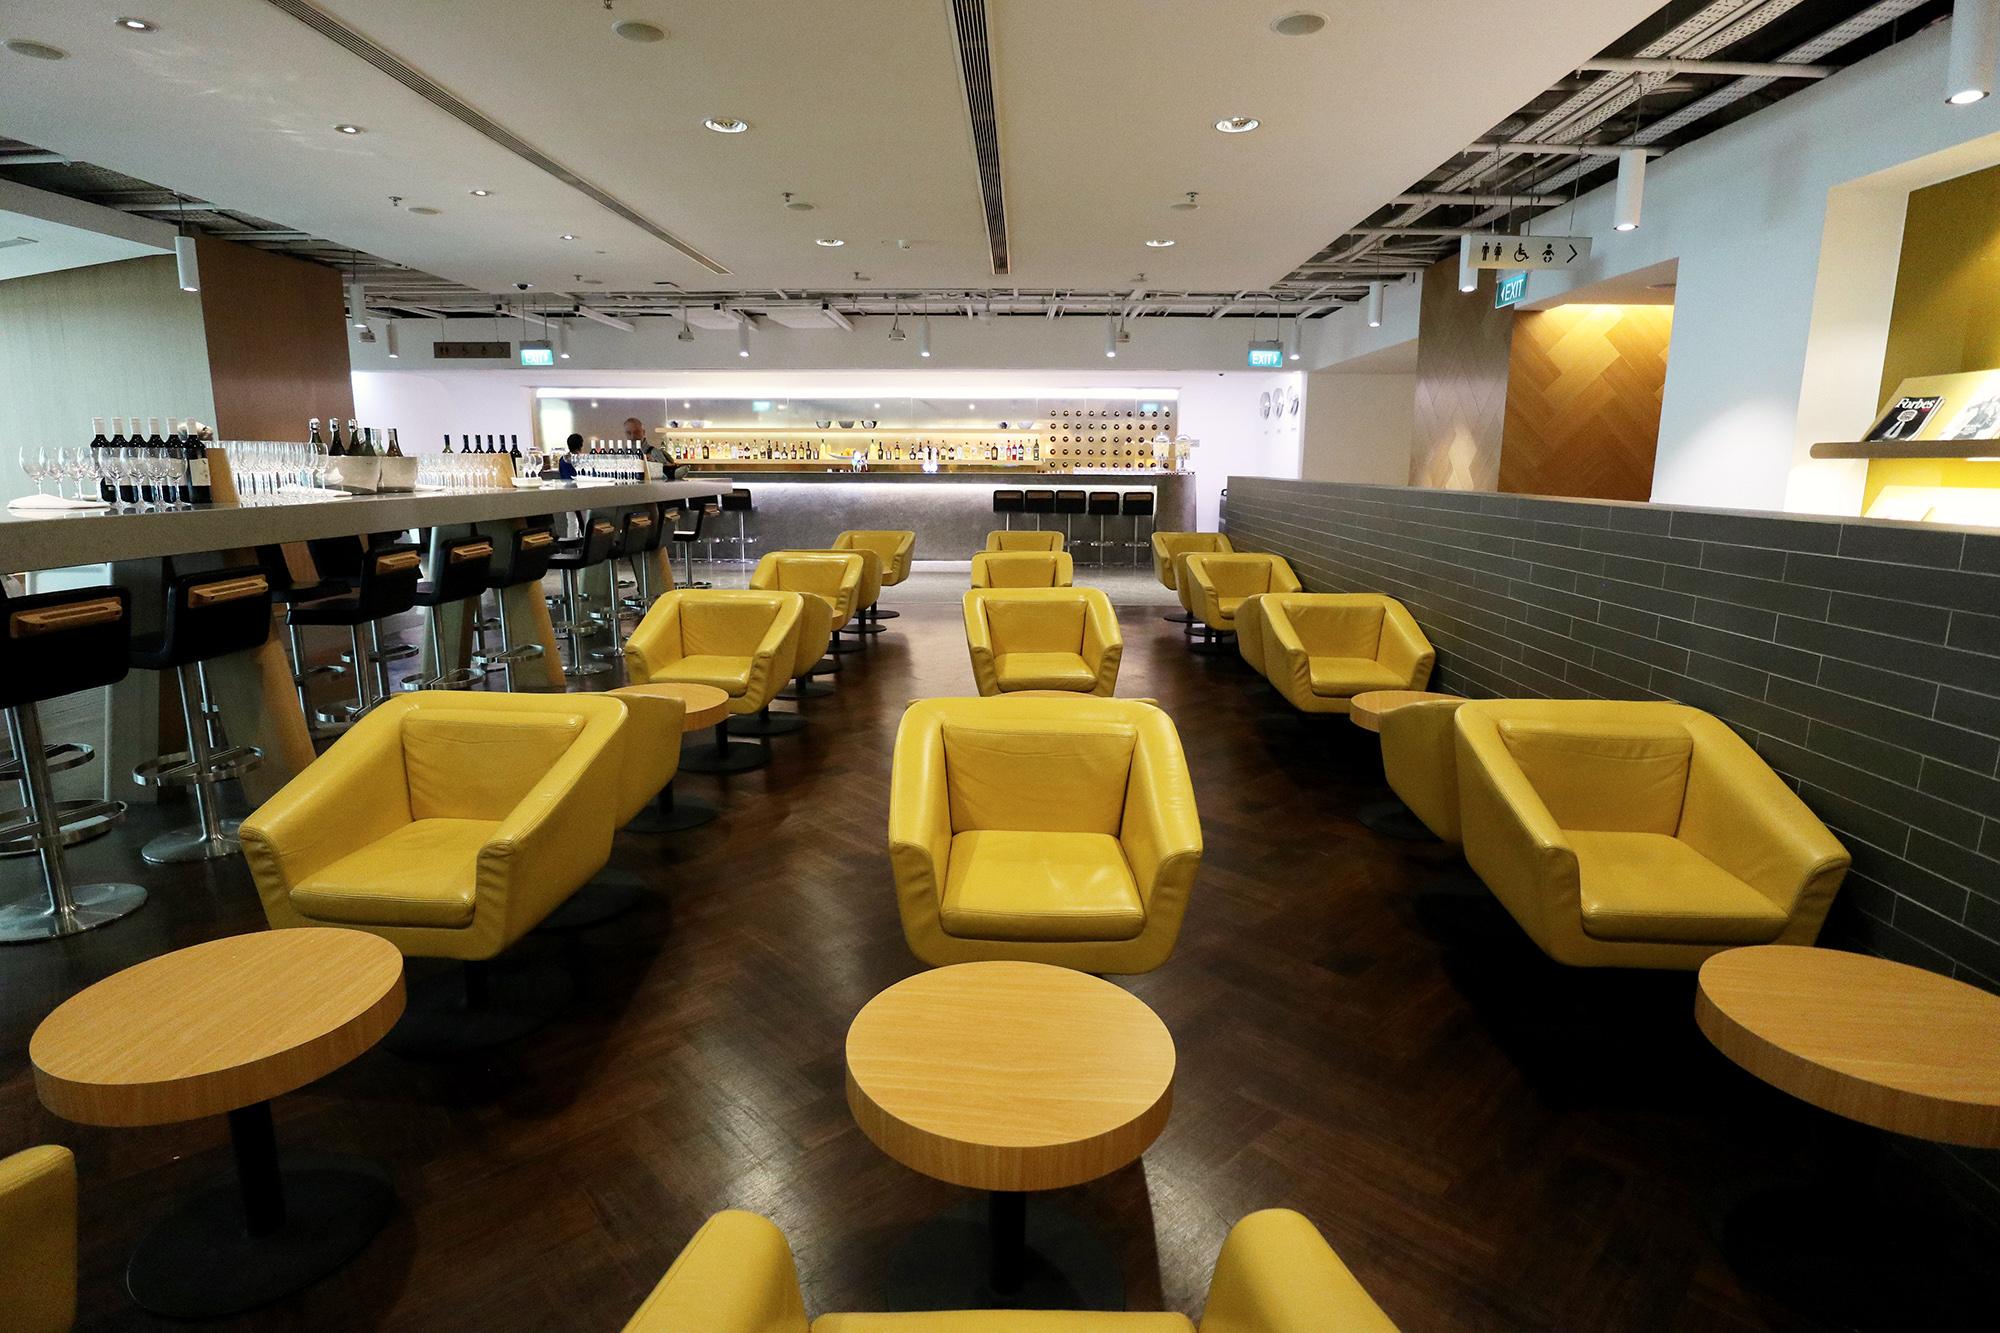 Chairs Yellow Bar.jpg